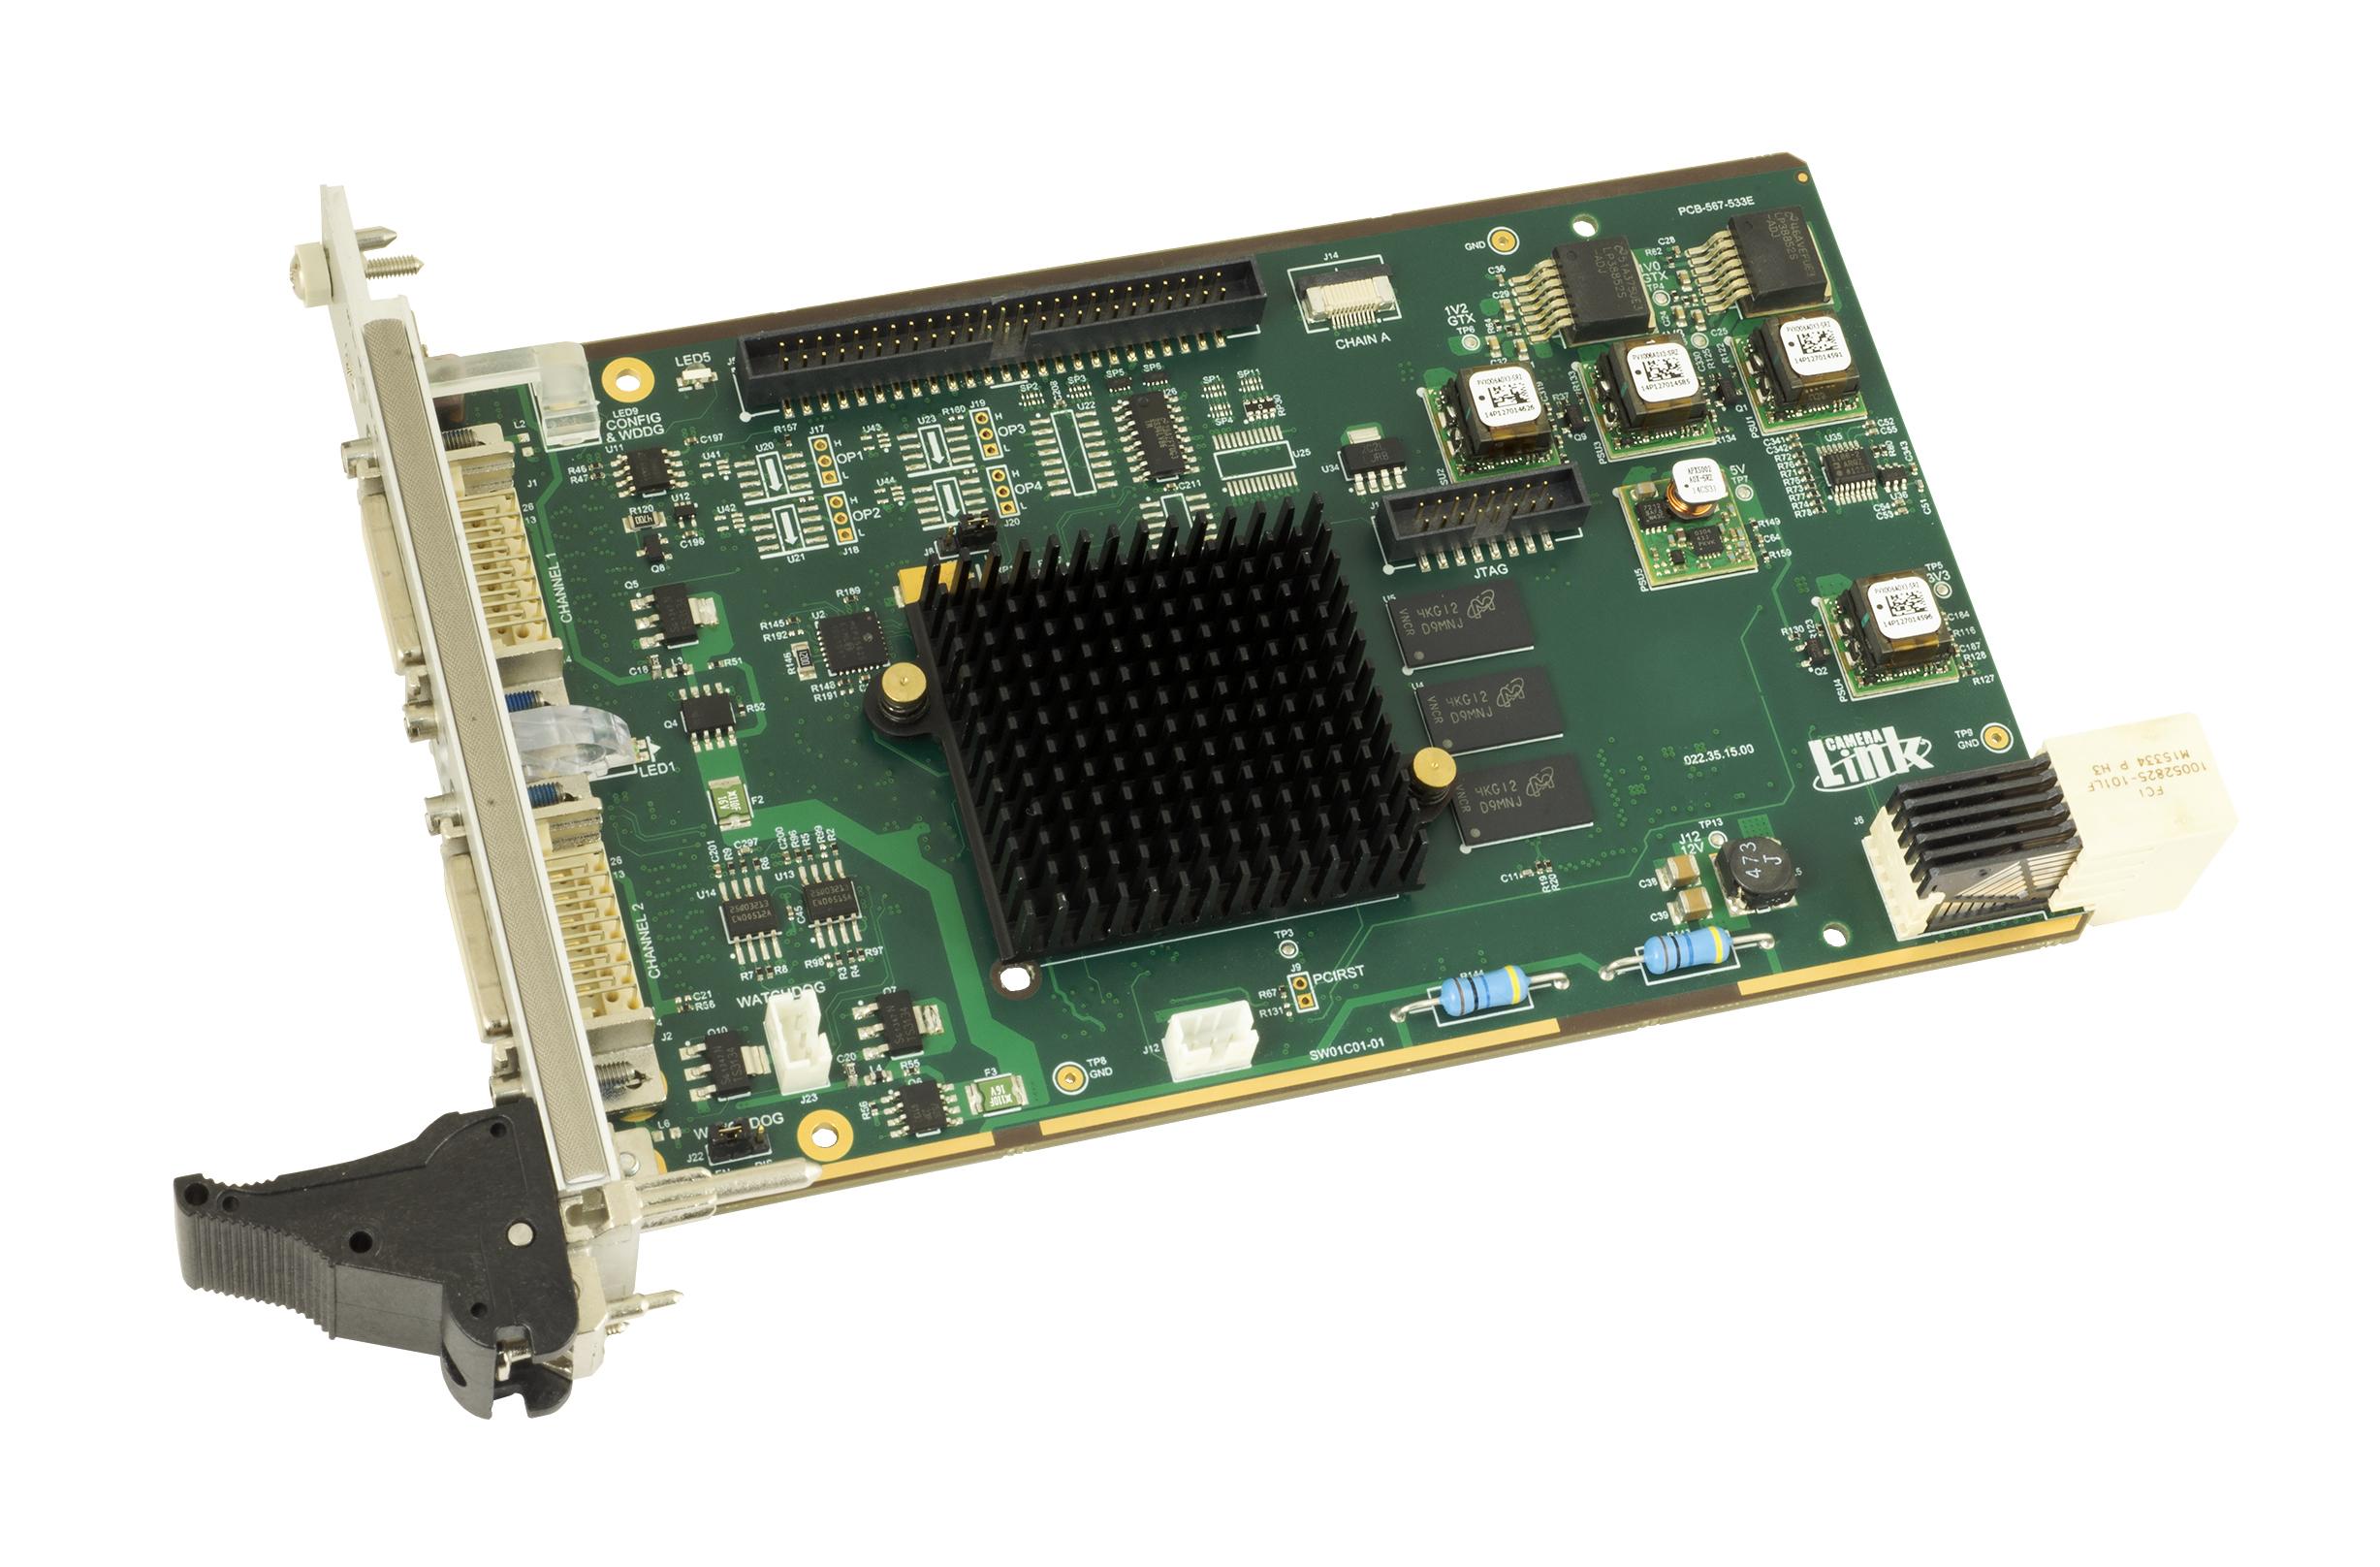 Camera Link 3U cPCI Serial Framegrabber